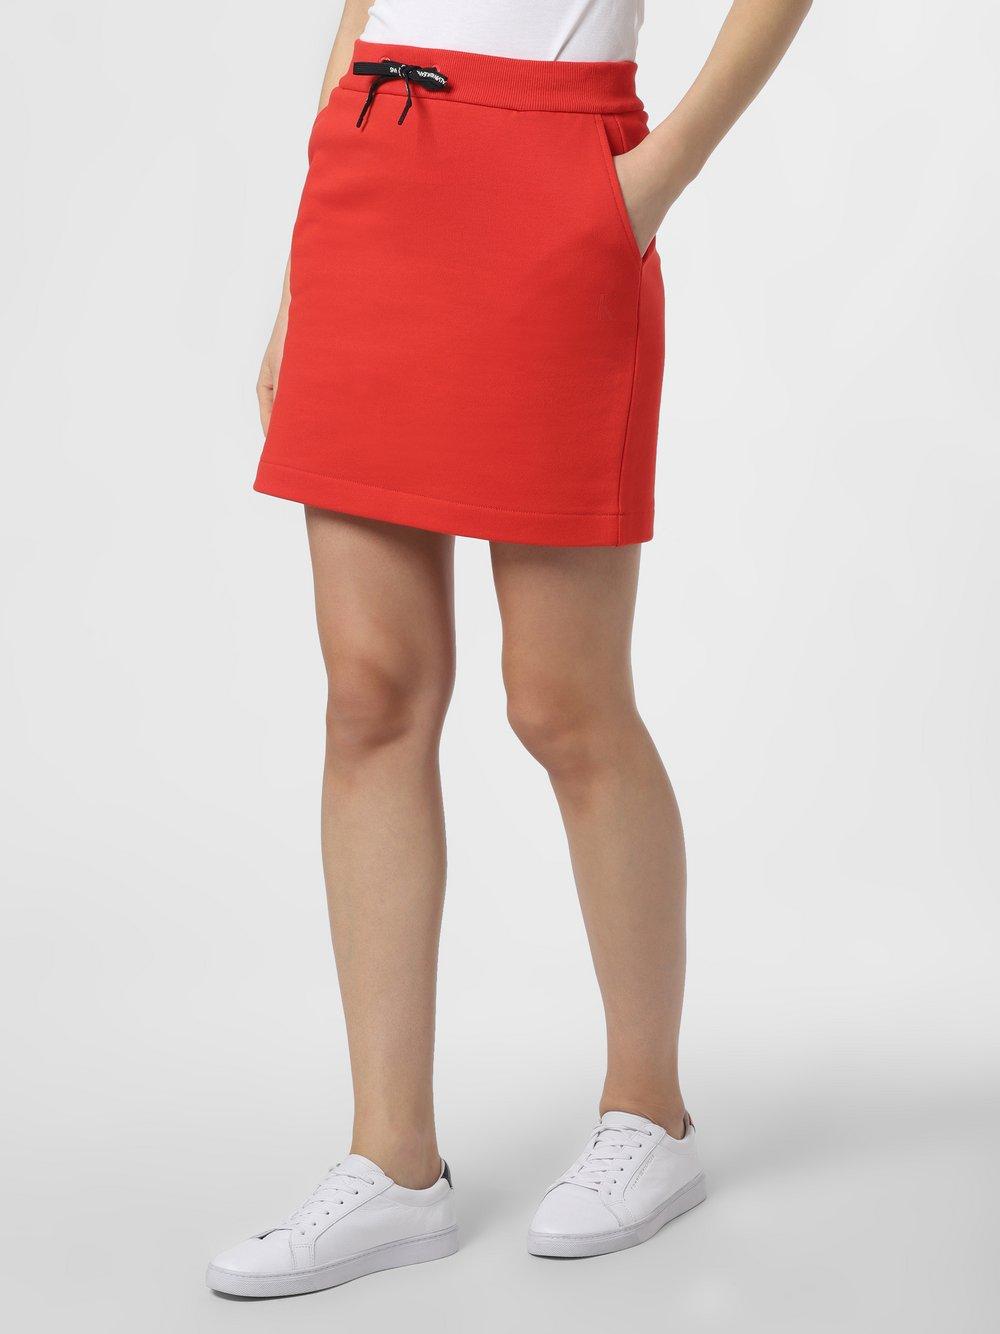 Calvin Klein Jeans - Spódnica damska, czerwony